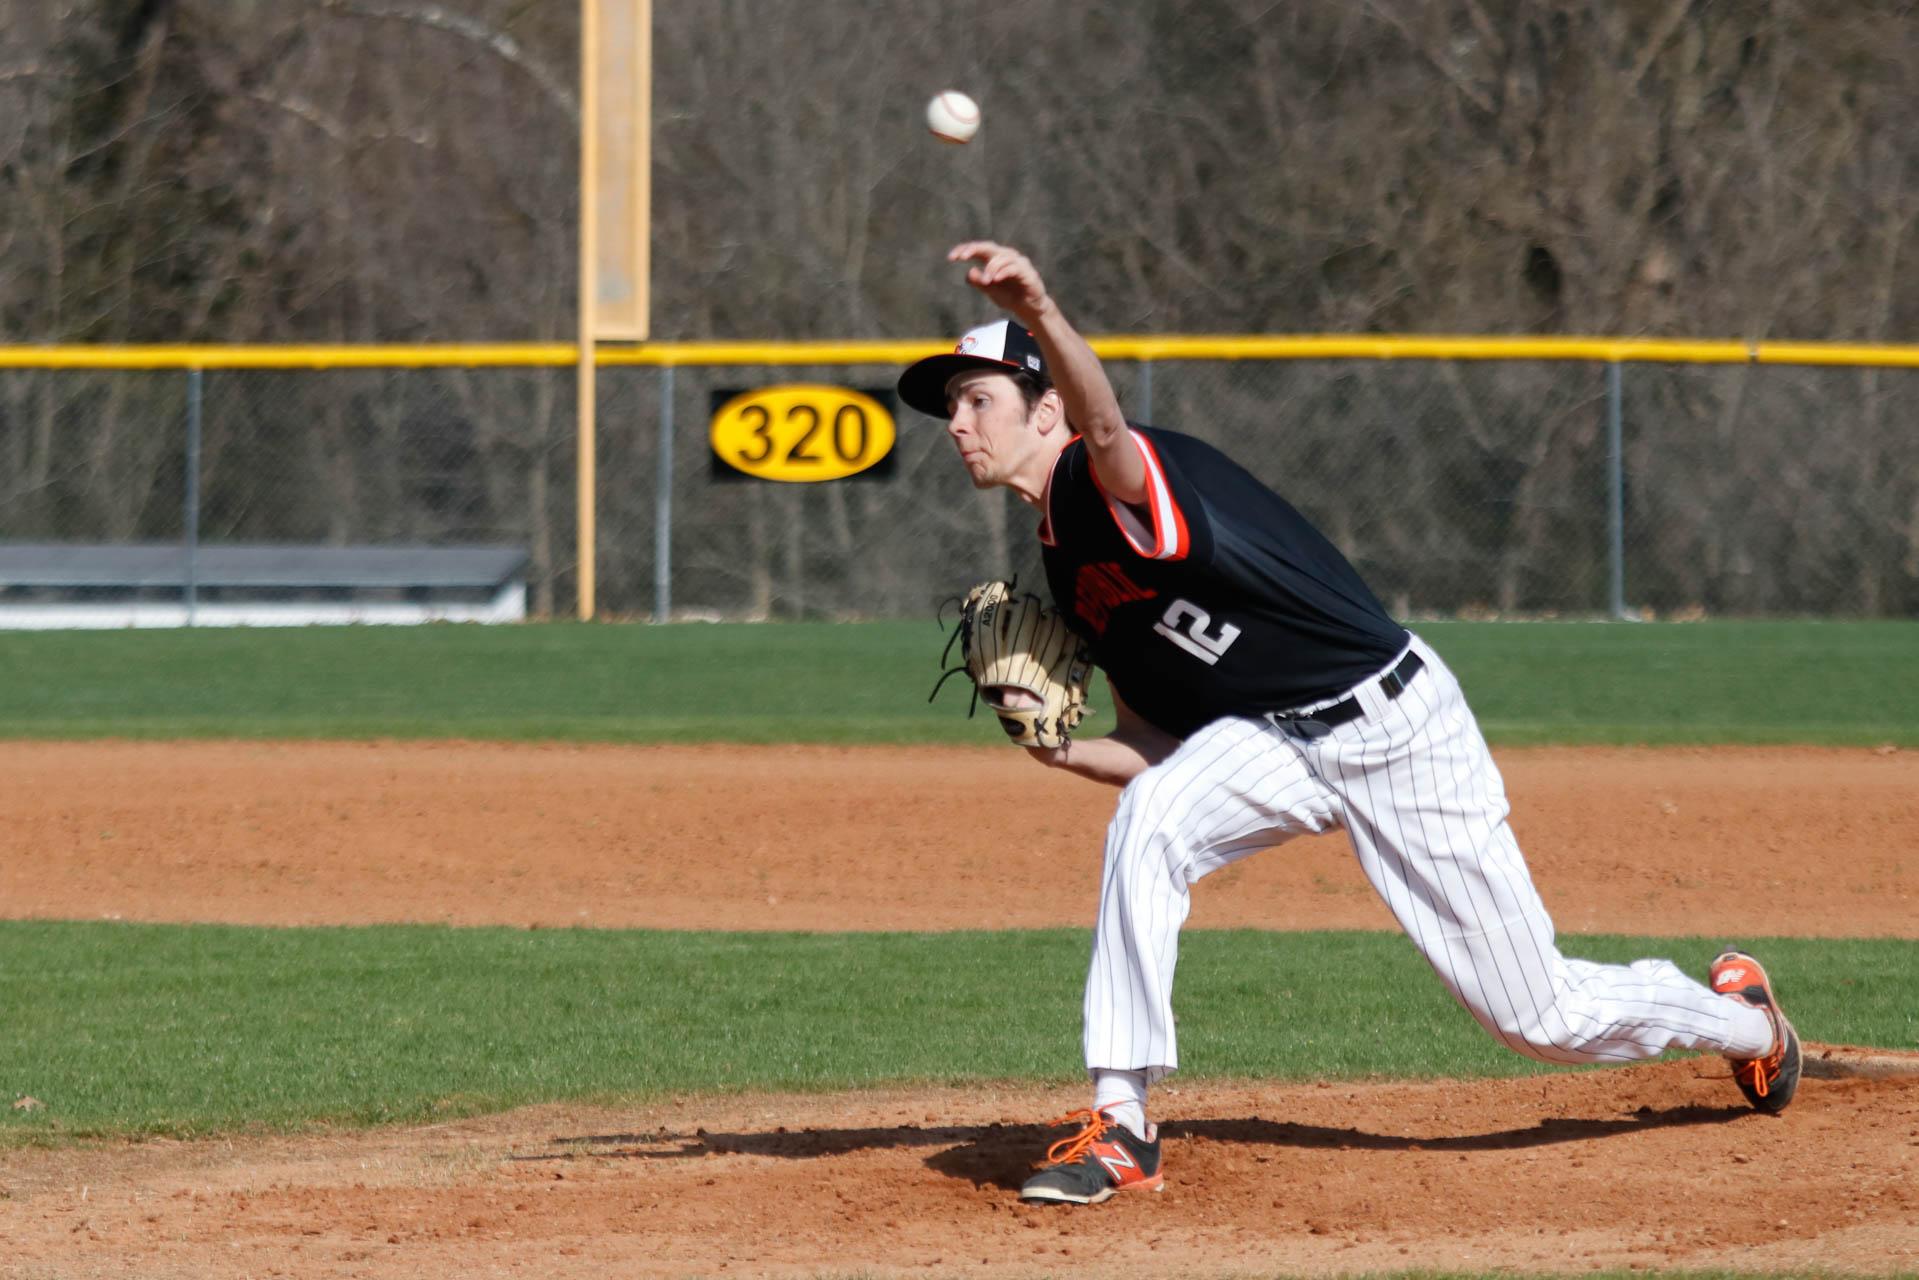 Double Damage: Extra-Base Hits Key Tiger Win